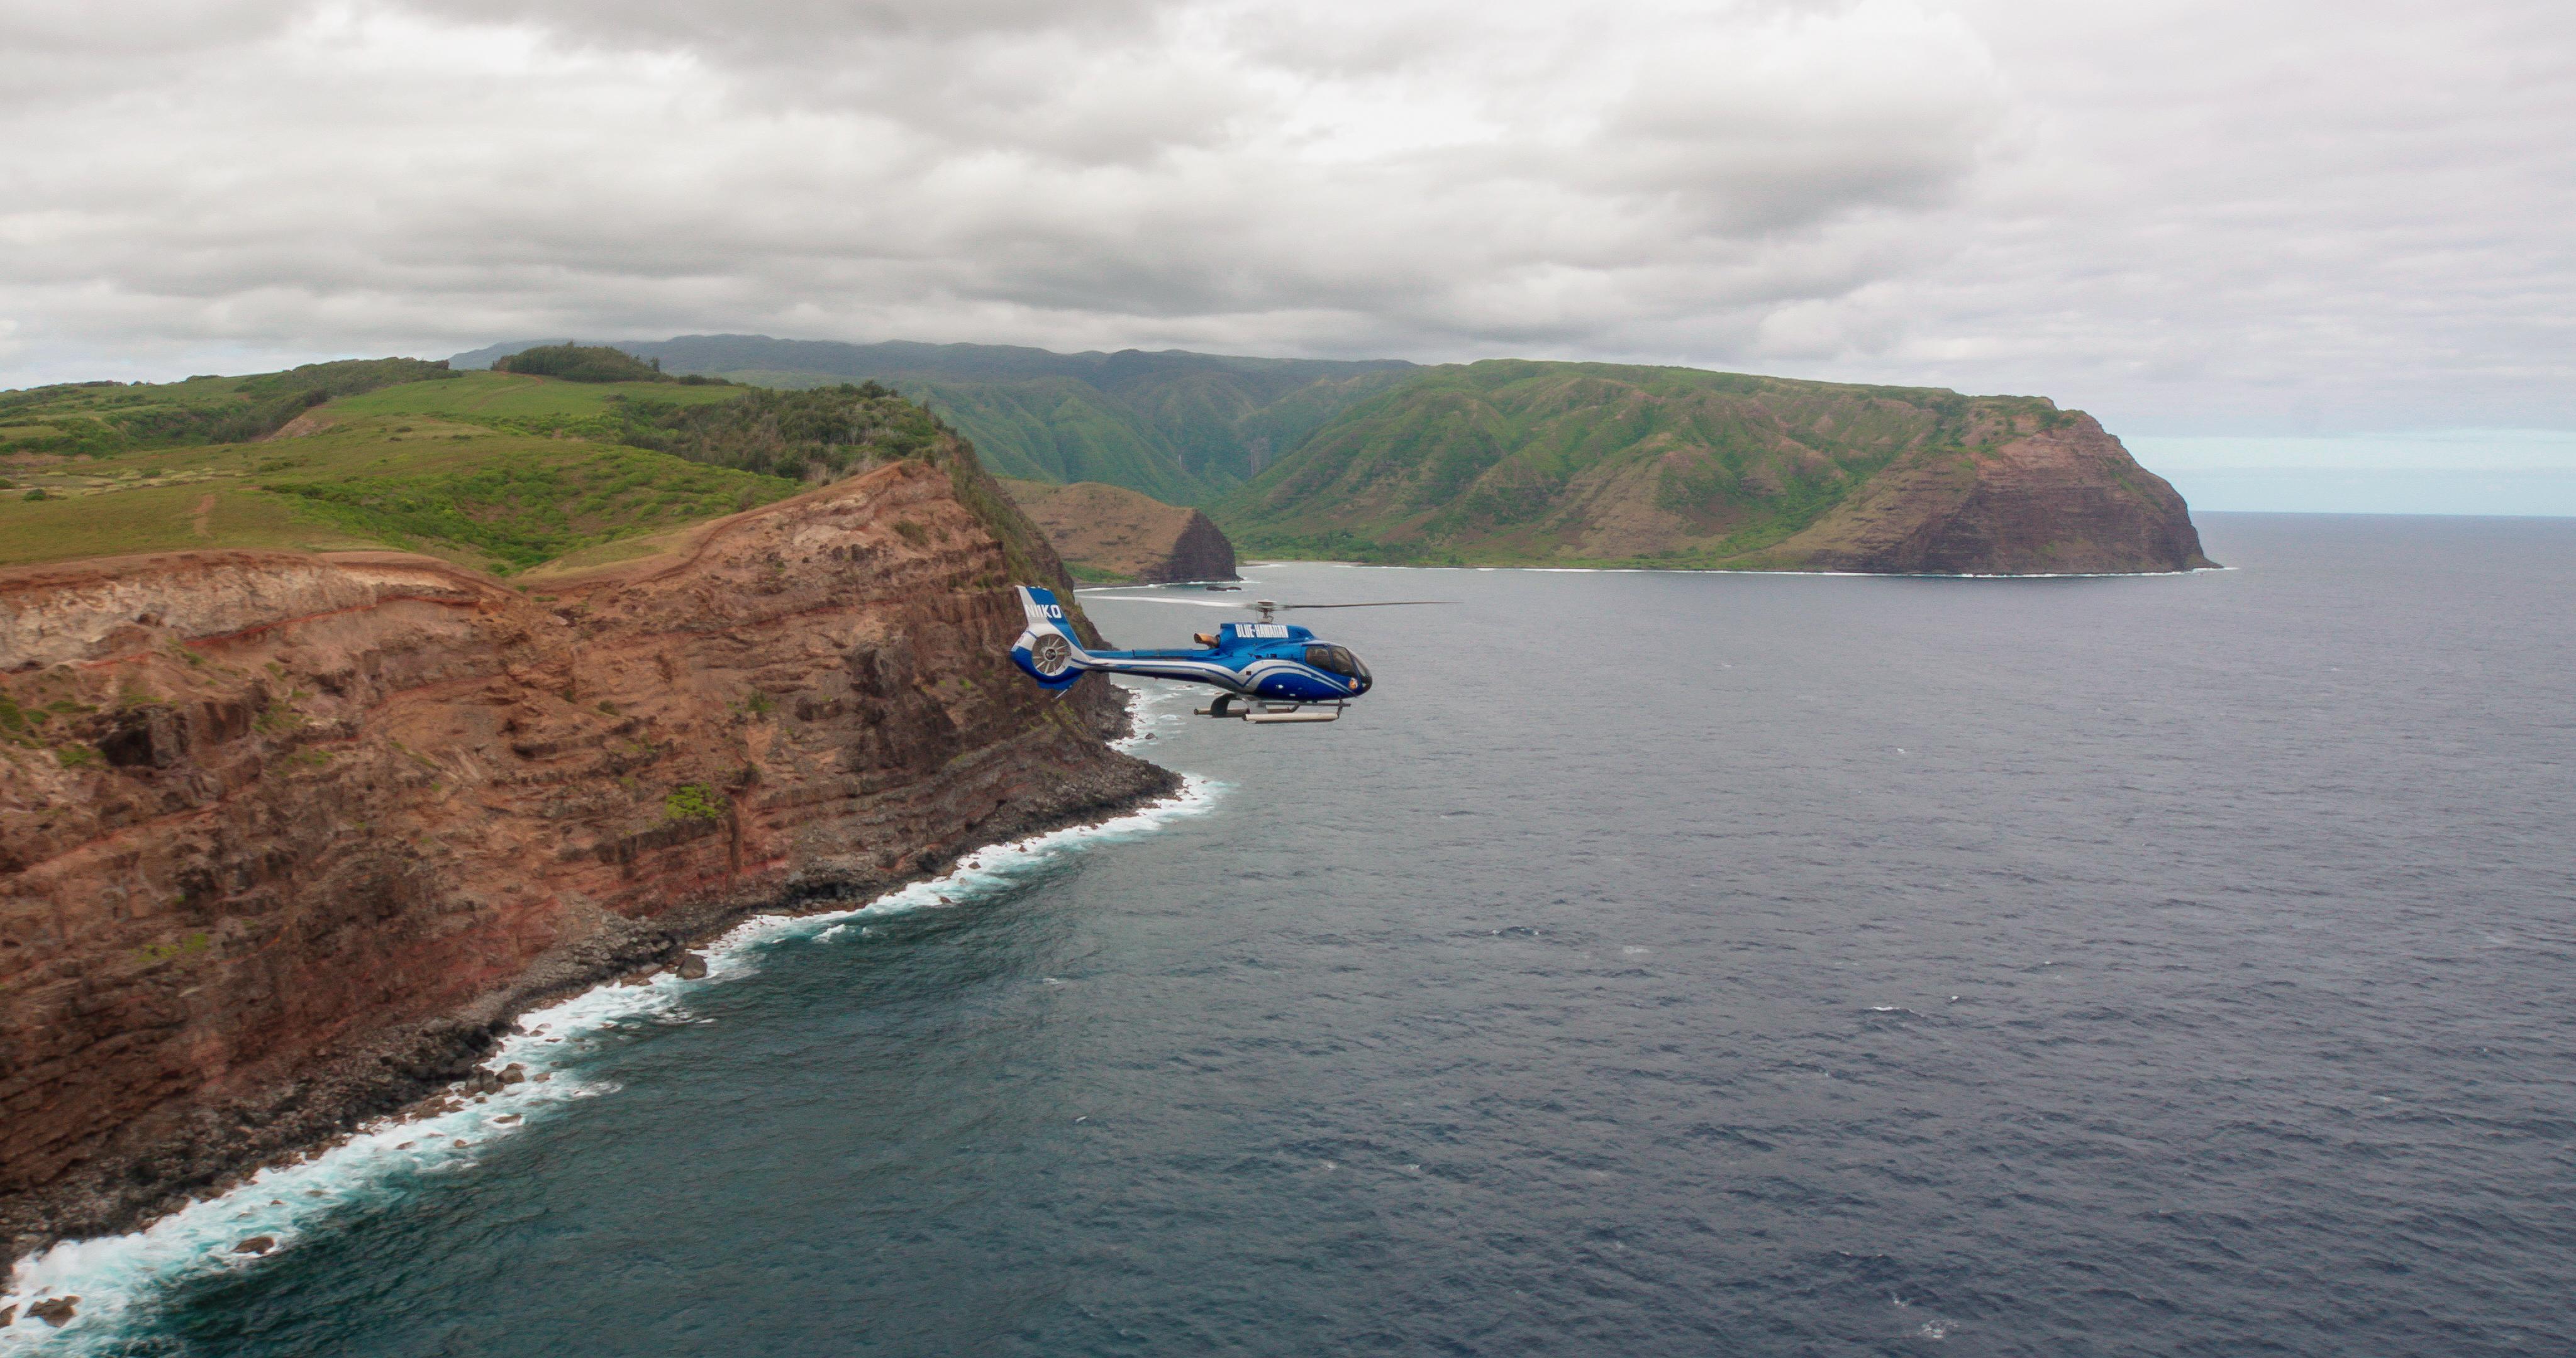 Product West Maui & Molokai Eco Helicopter Tour